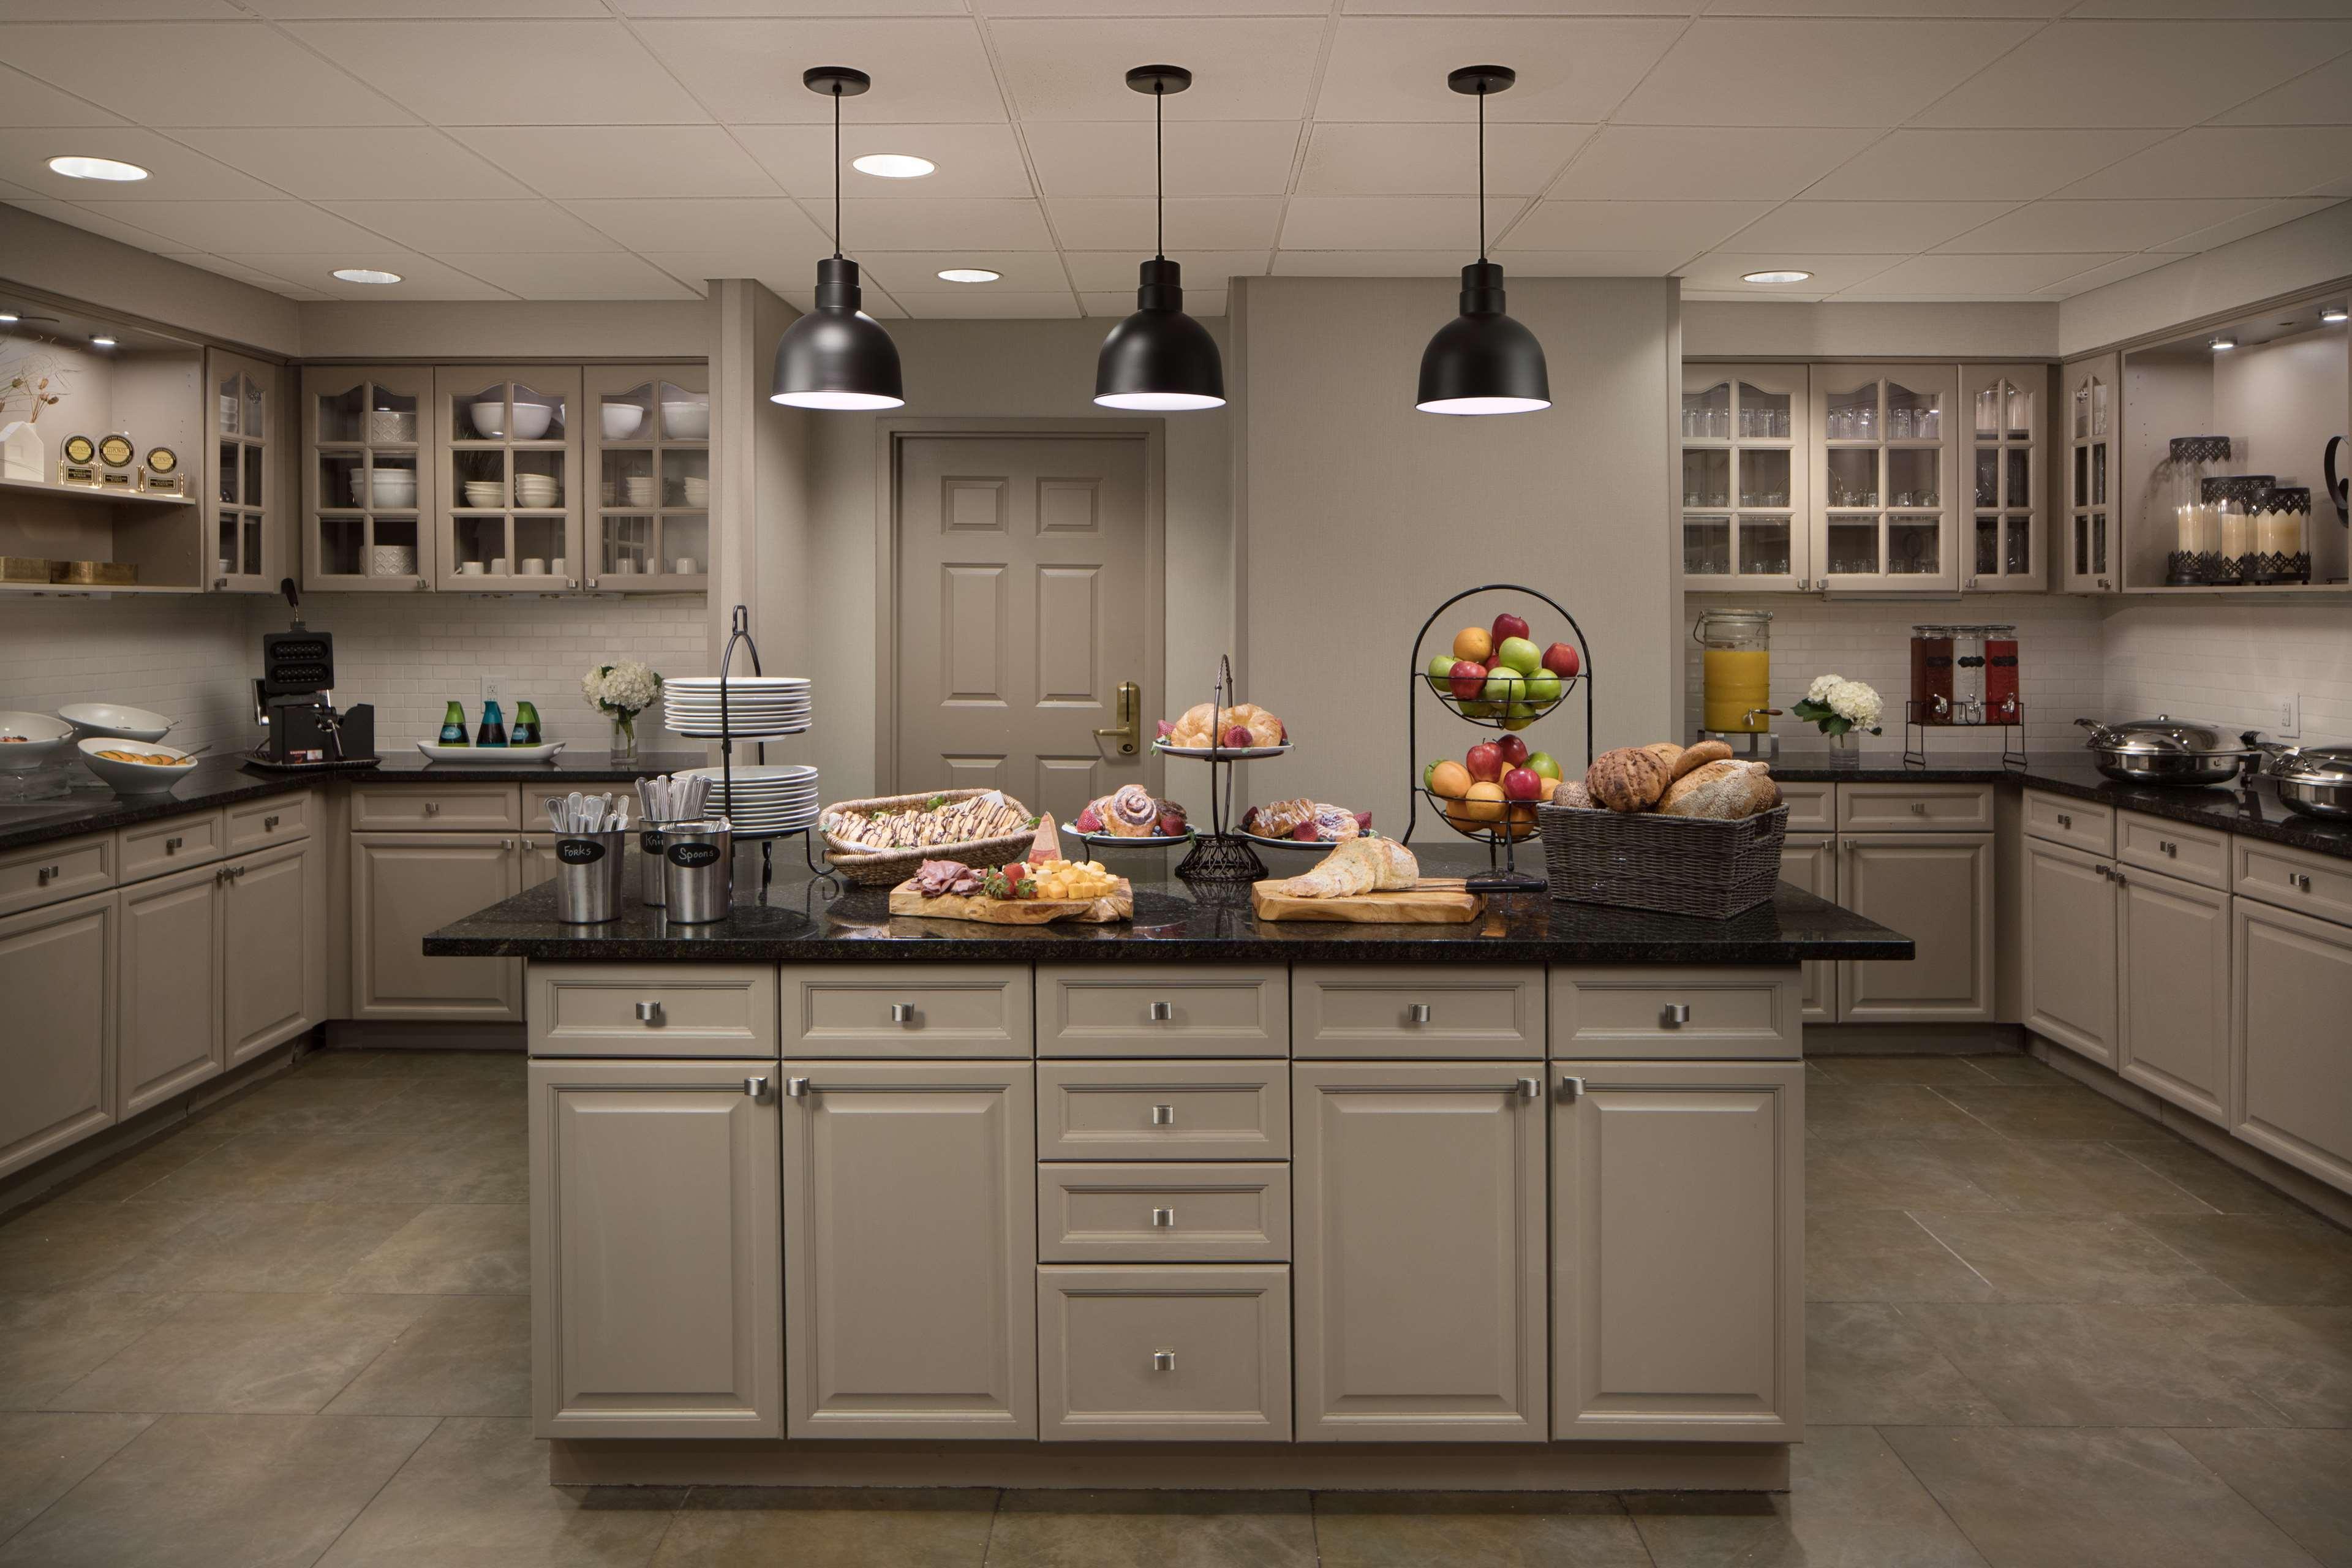 Homewood Suites by Hilton Lubbock image 9